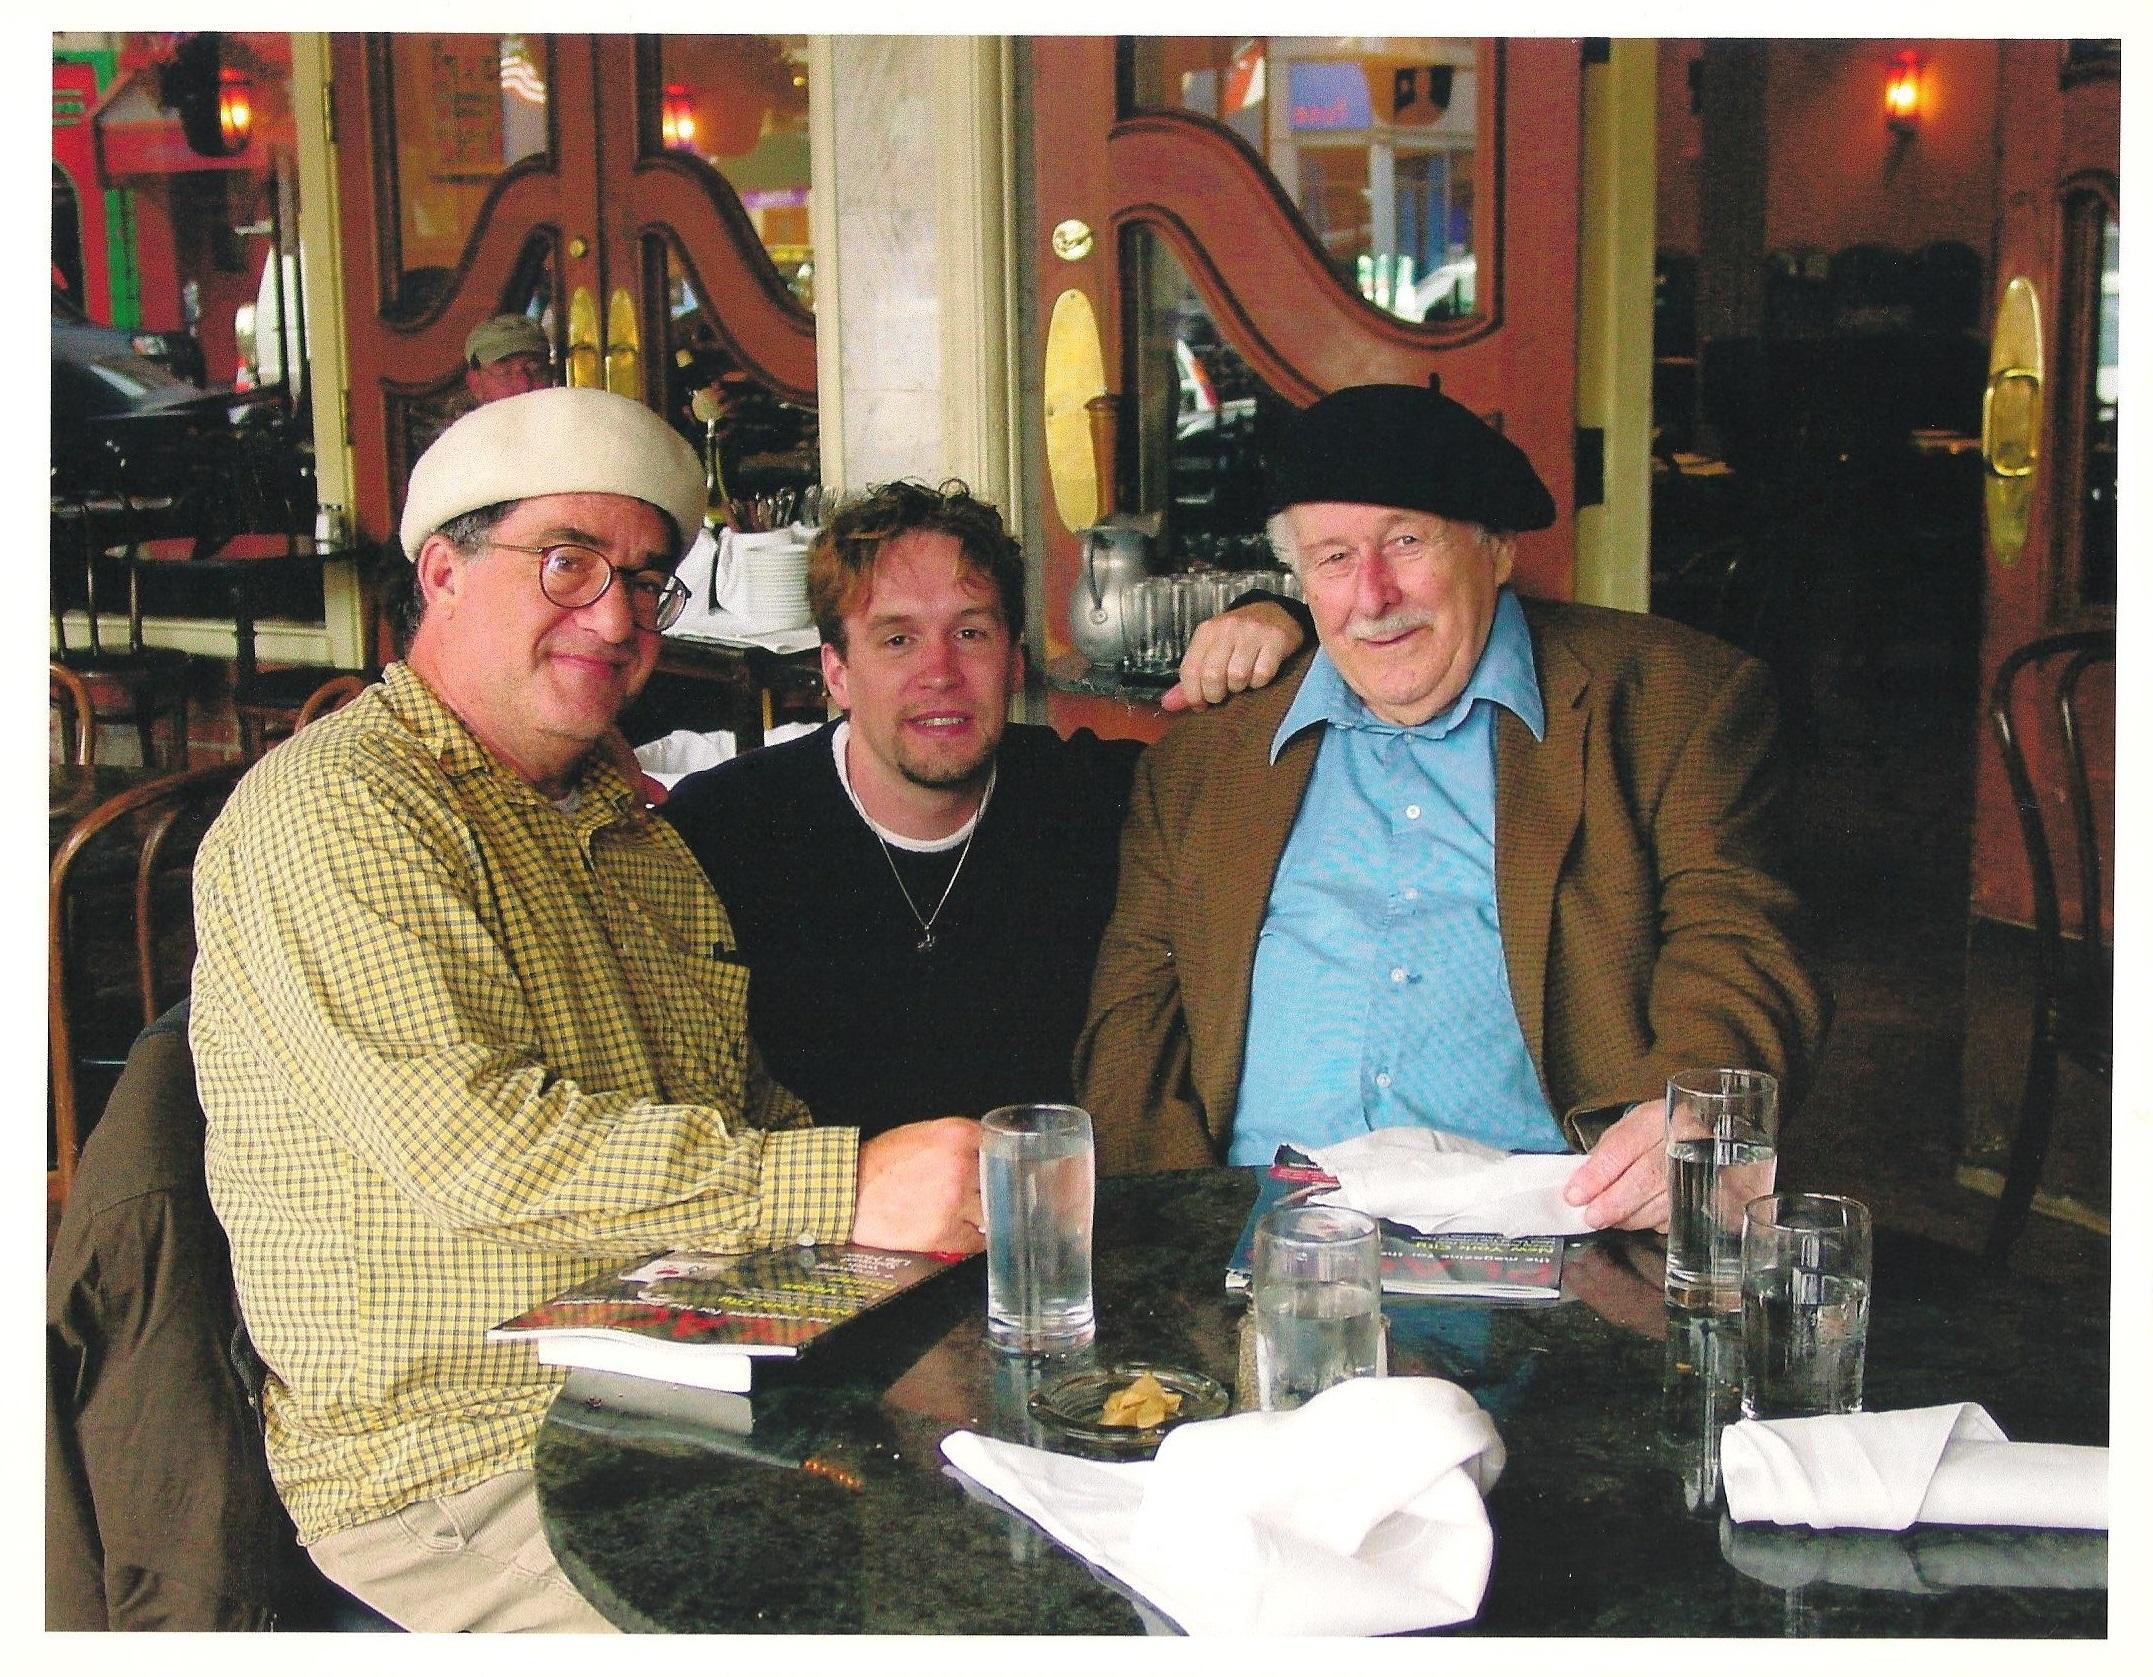 Jacob with poet Neeli Cherkovski (left) and American impresario Enrico Banducci (right) at Enrico's Sidewalk Café in North Beach, San Francisco.